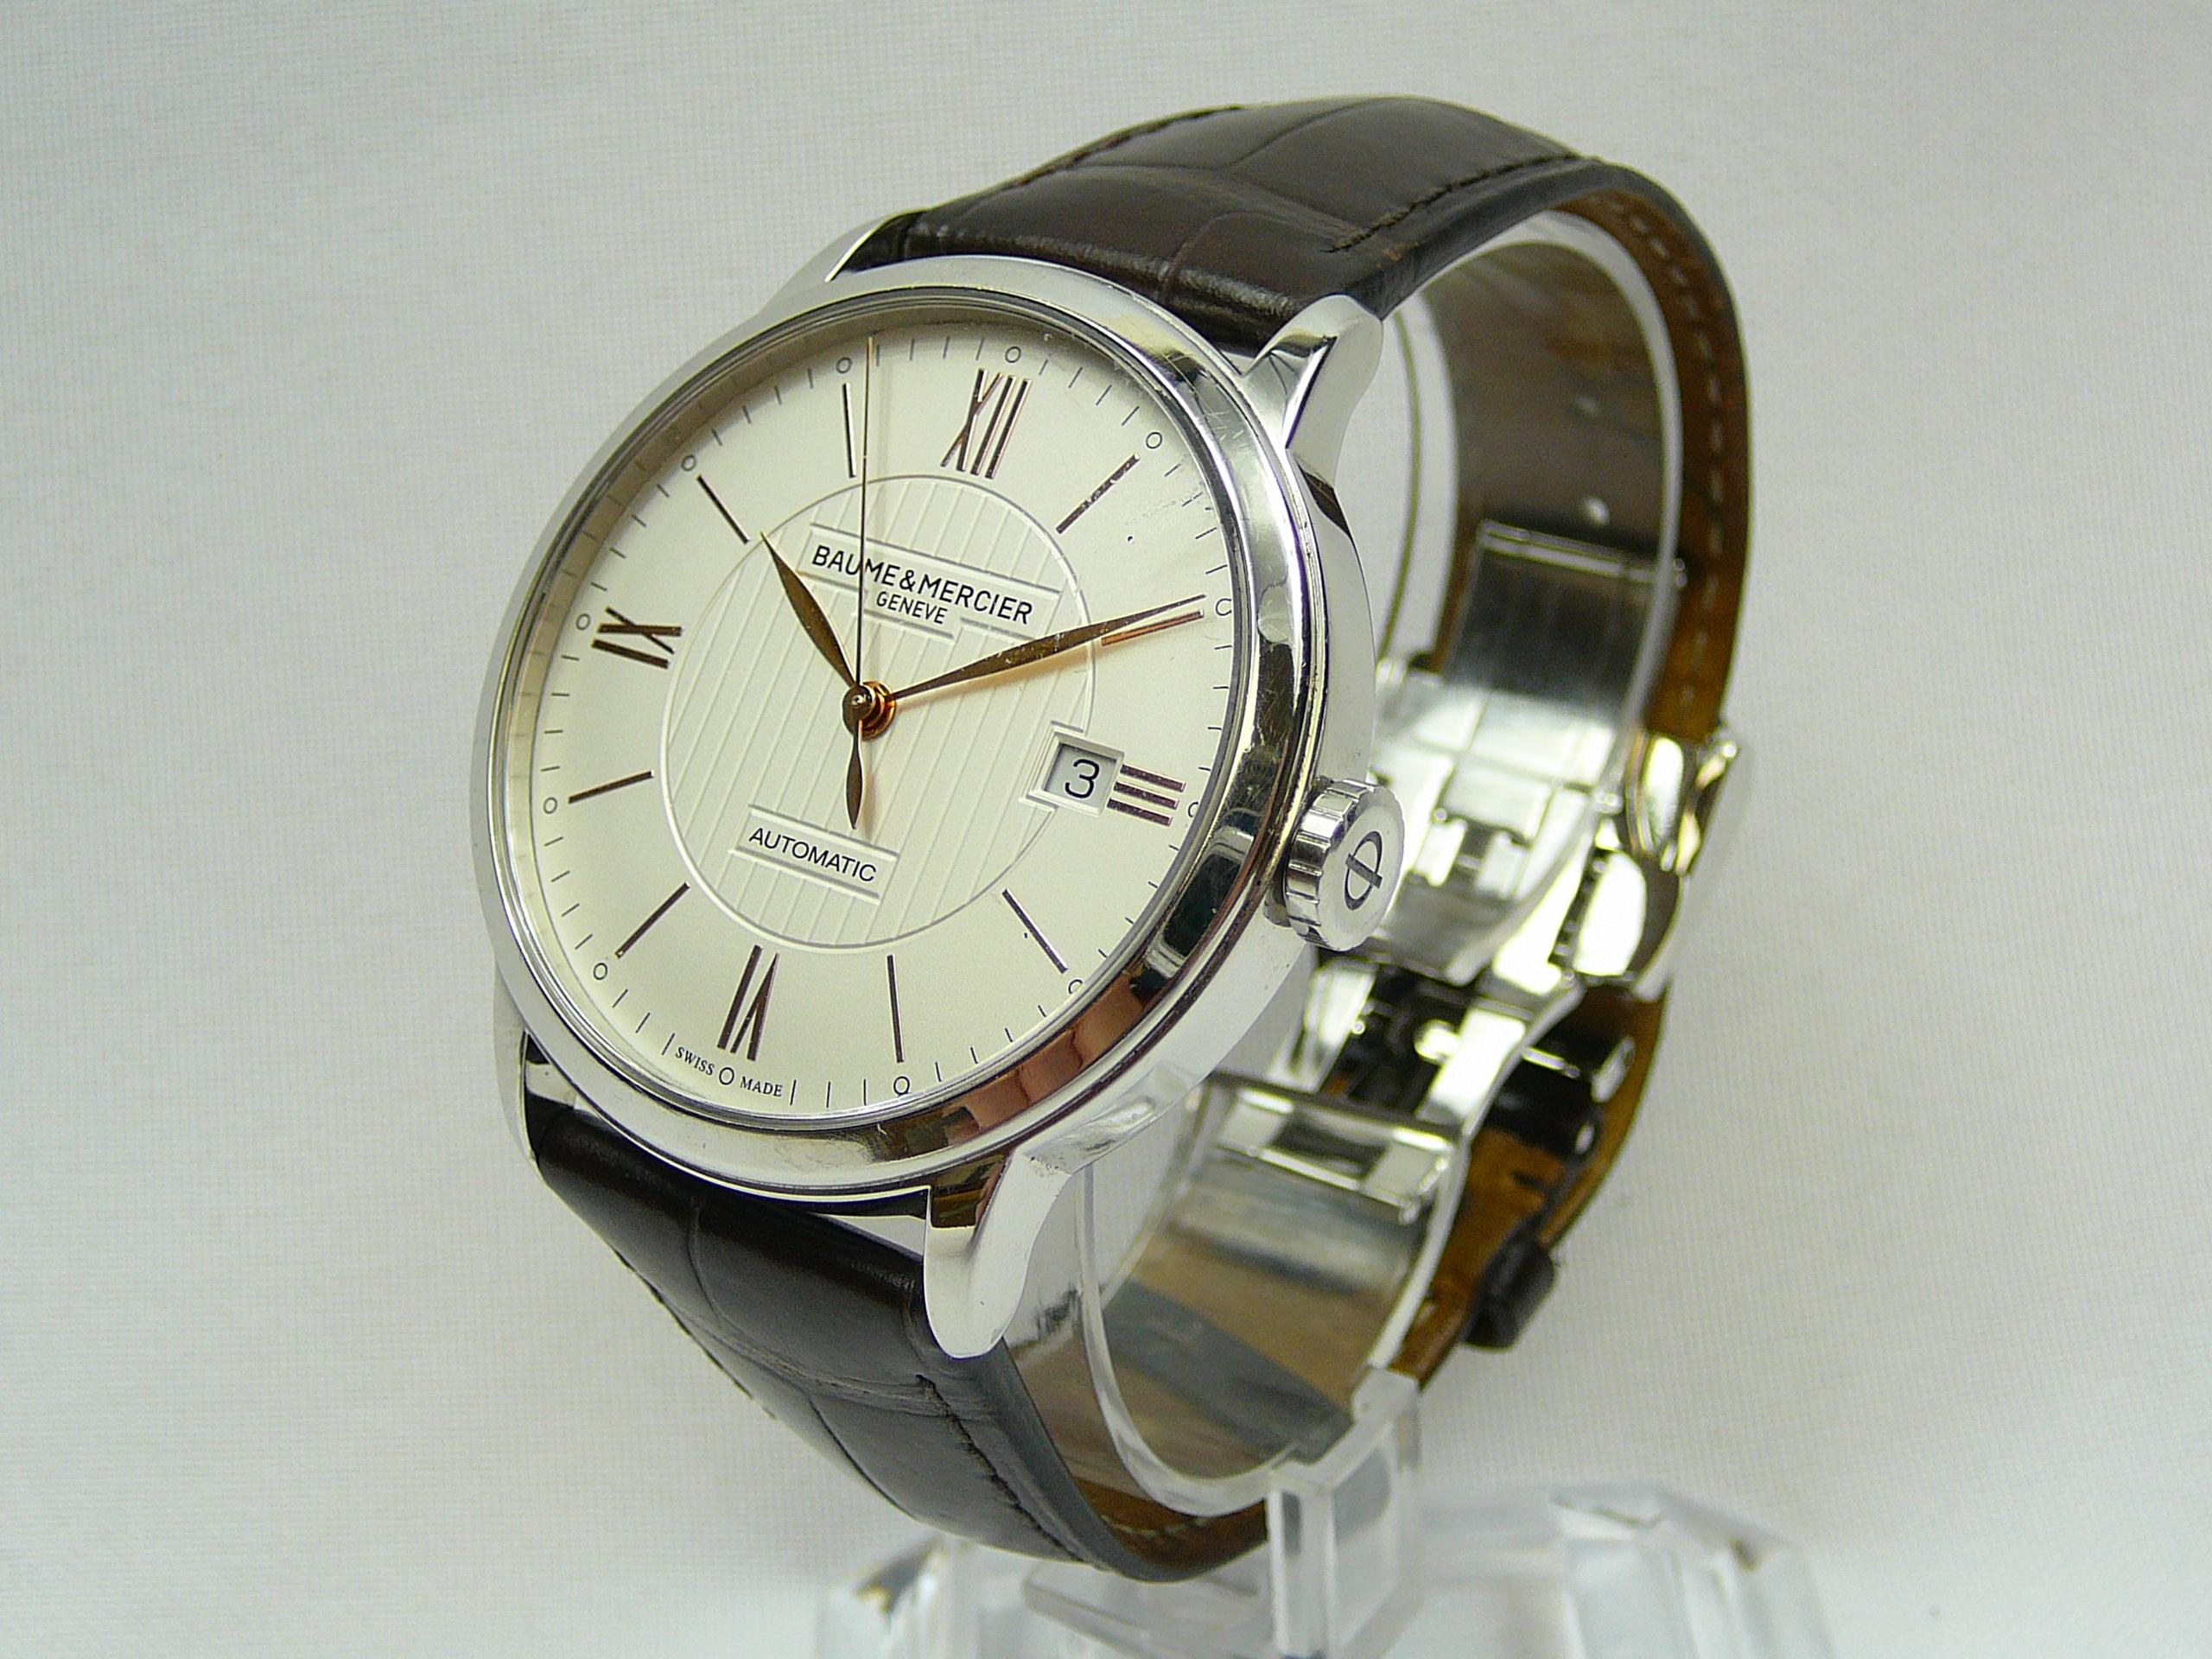 Gents Baume & Mercier Wrist Watch